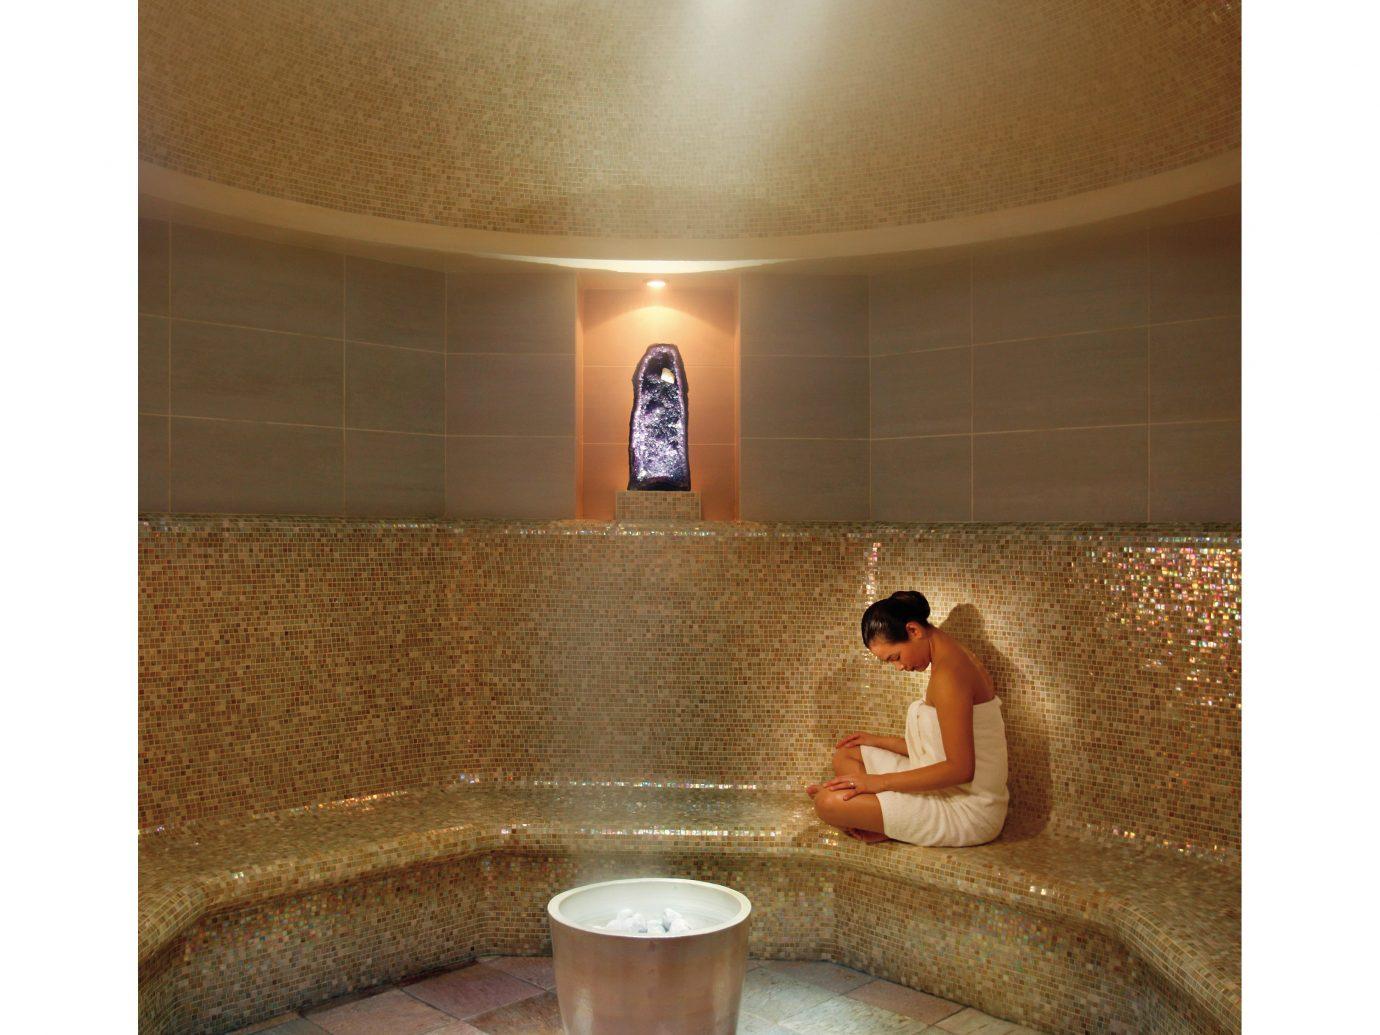 Amethyst crystal steam room at the Mandarin Oriental in NYC